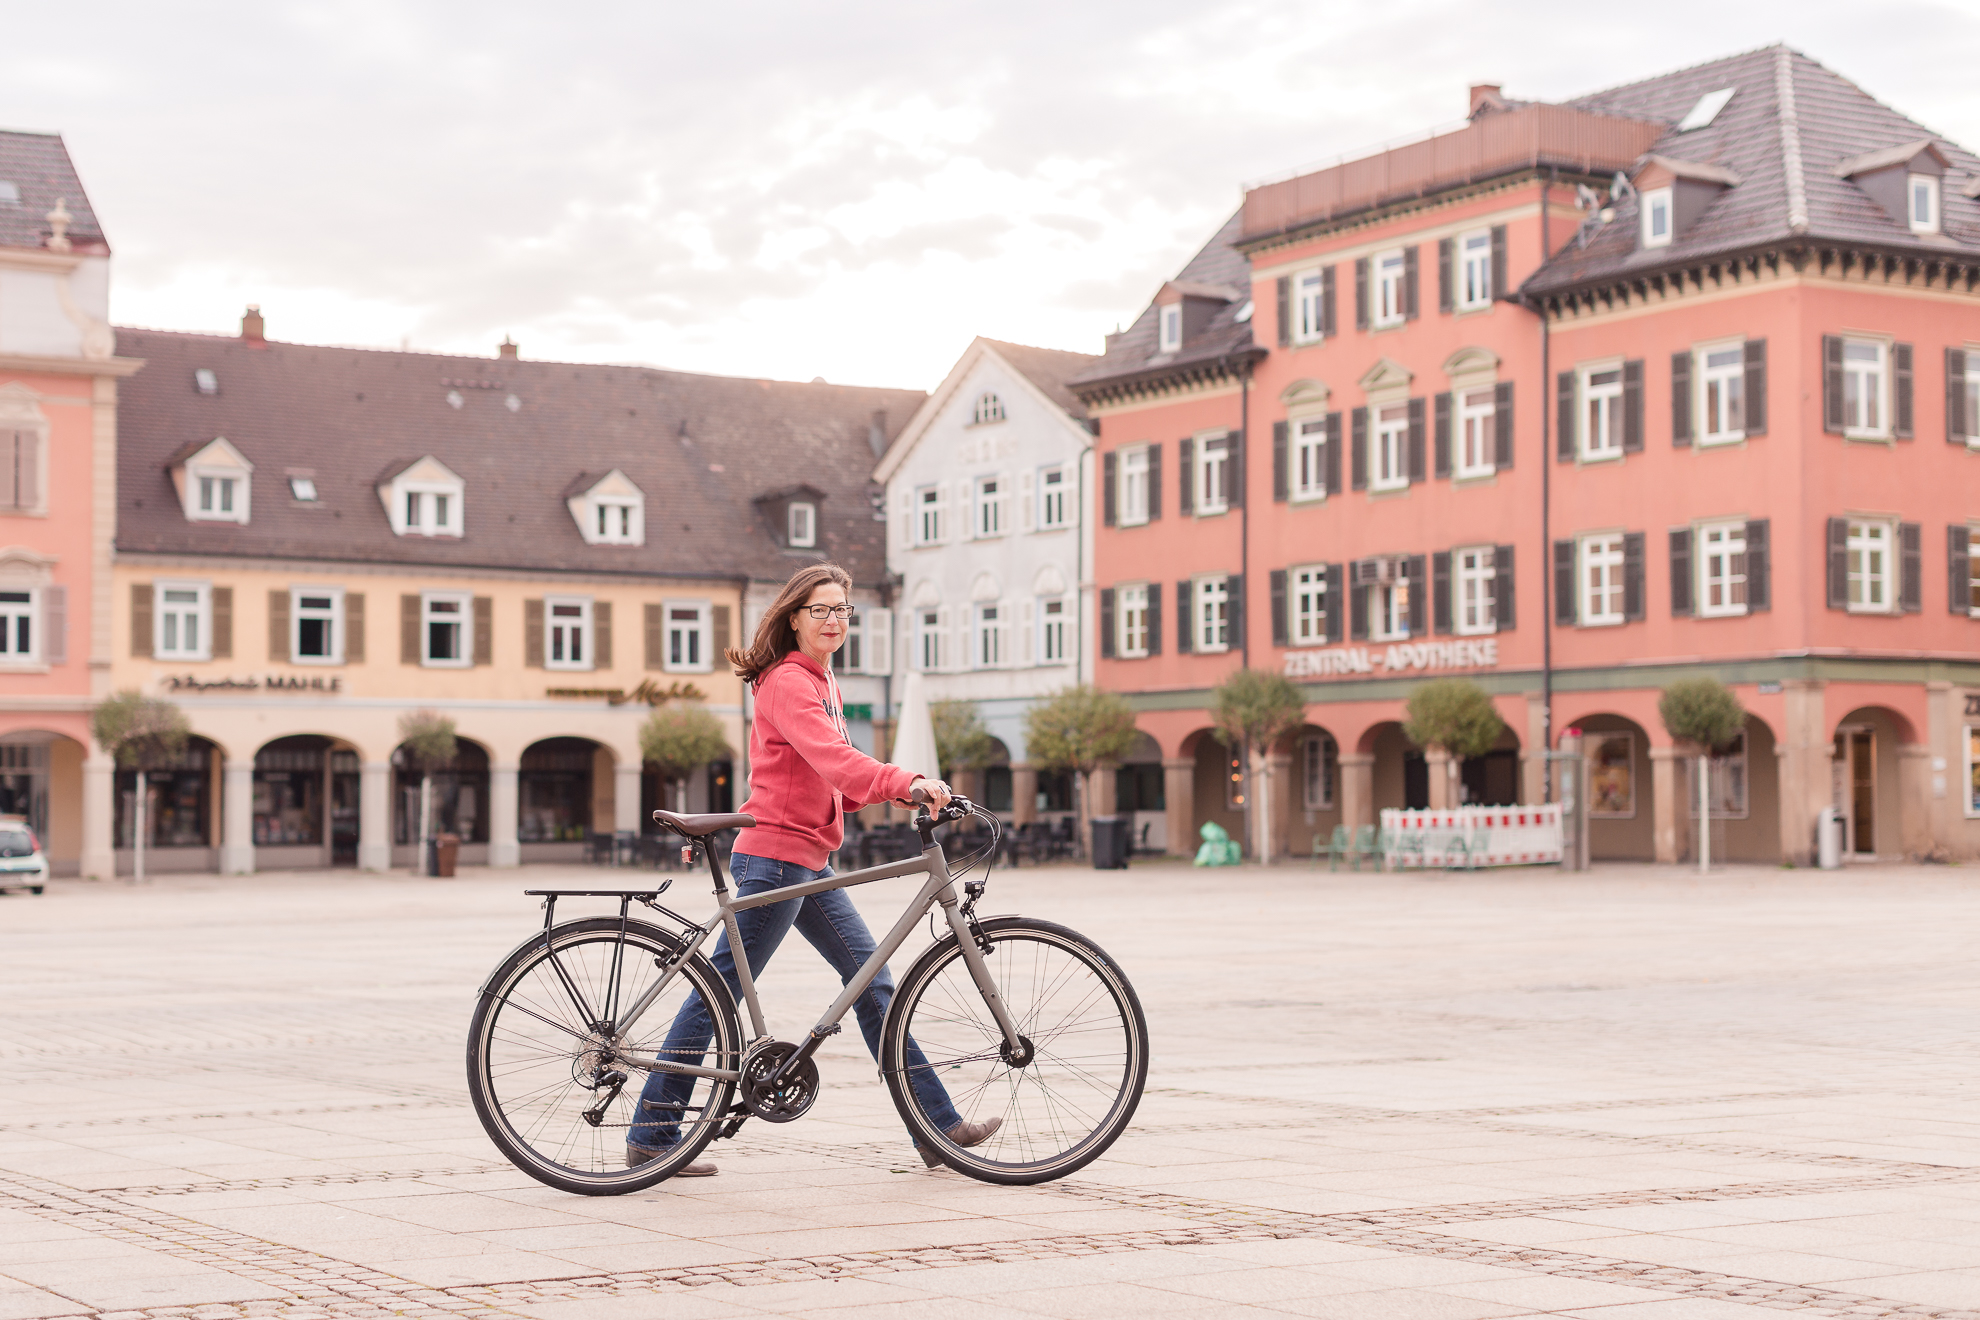 AB_20171020_Karl-FahrradPortraits_046-282.jpg